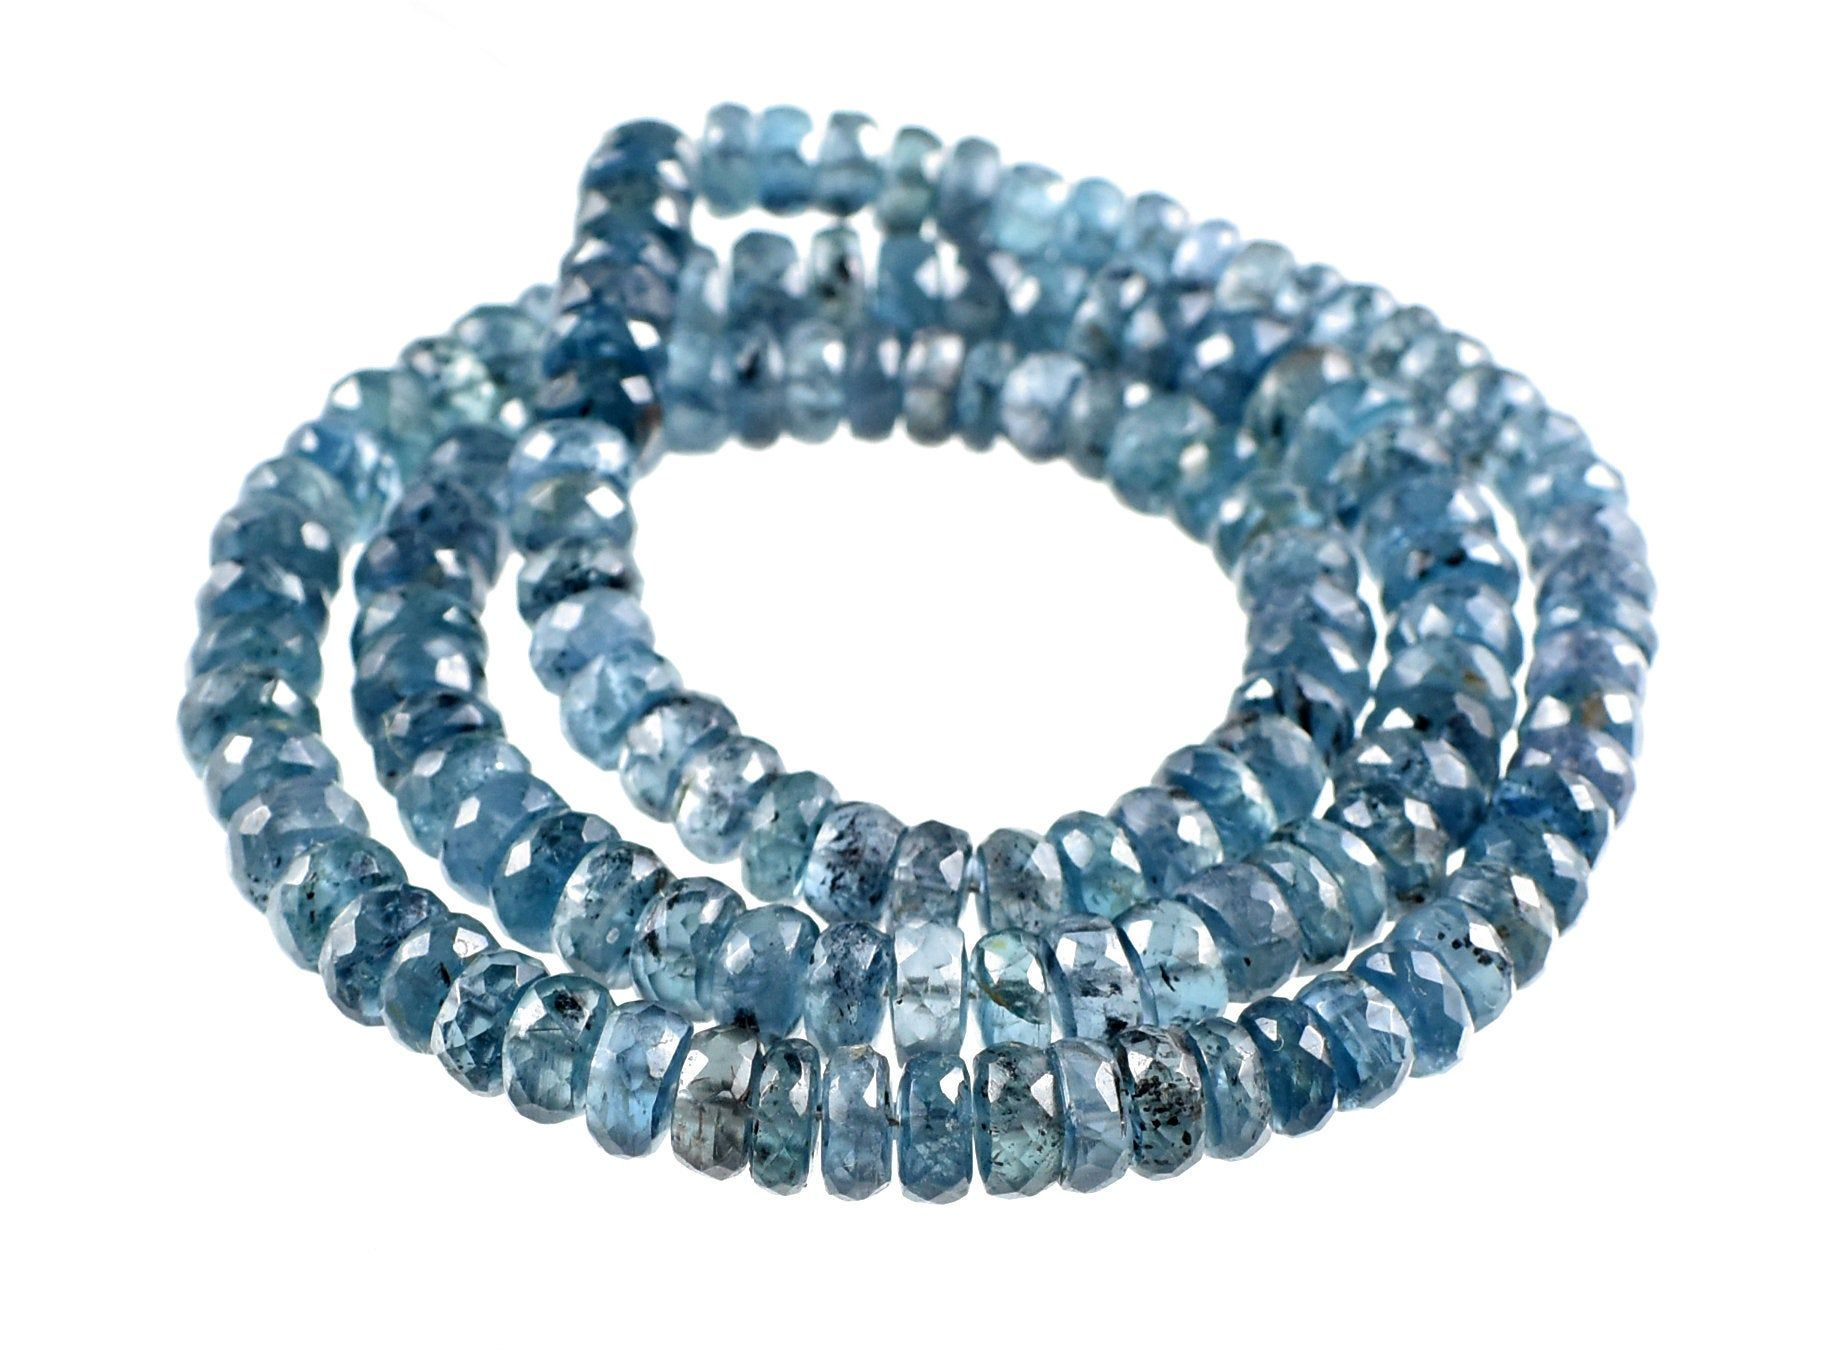 Teal Blue Kyanite Gemstone Moss Kyanite Rondelle Beads Natural Indigo Kyanite Faceted Beads Shape 6-7 MM 16 Inch Strand RGP140-05